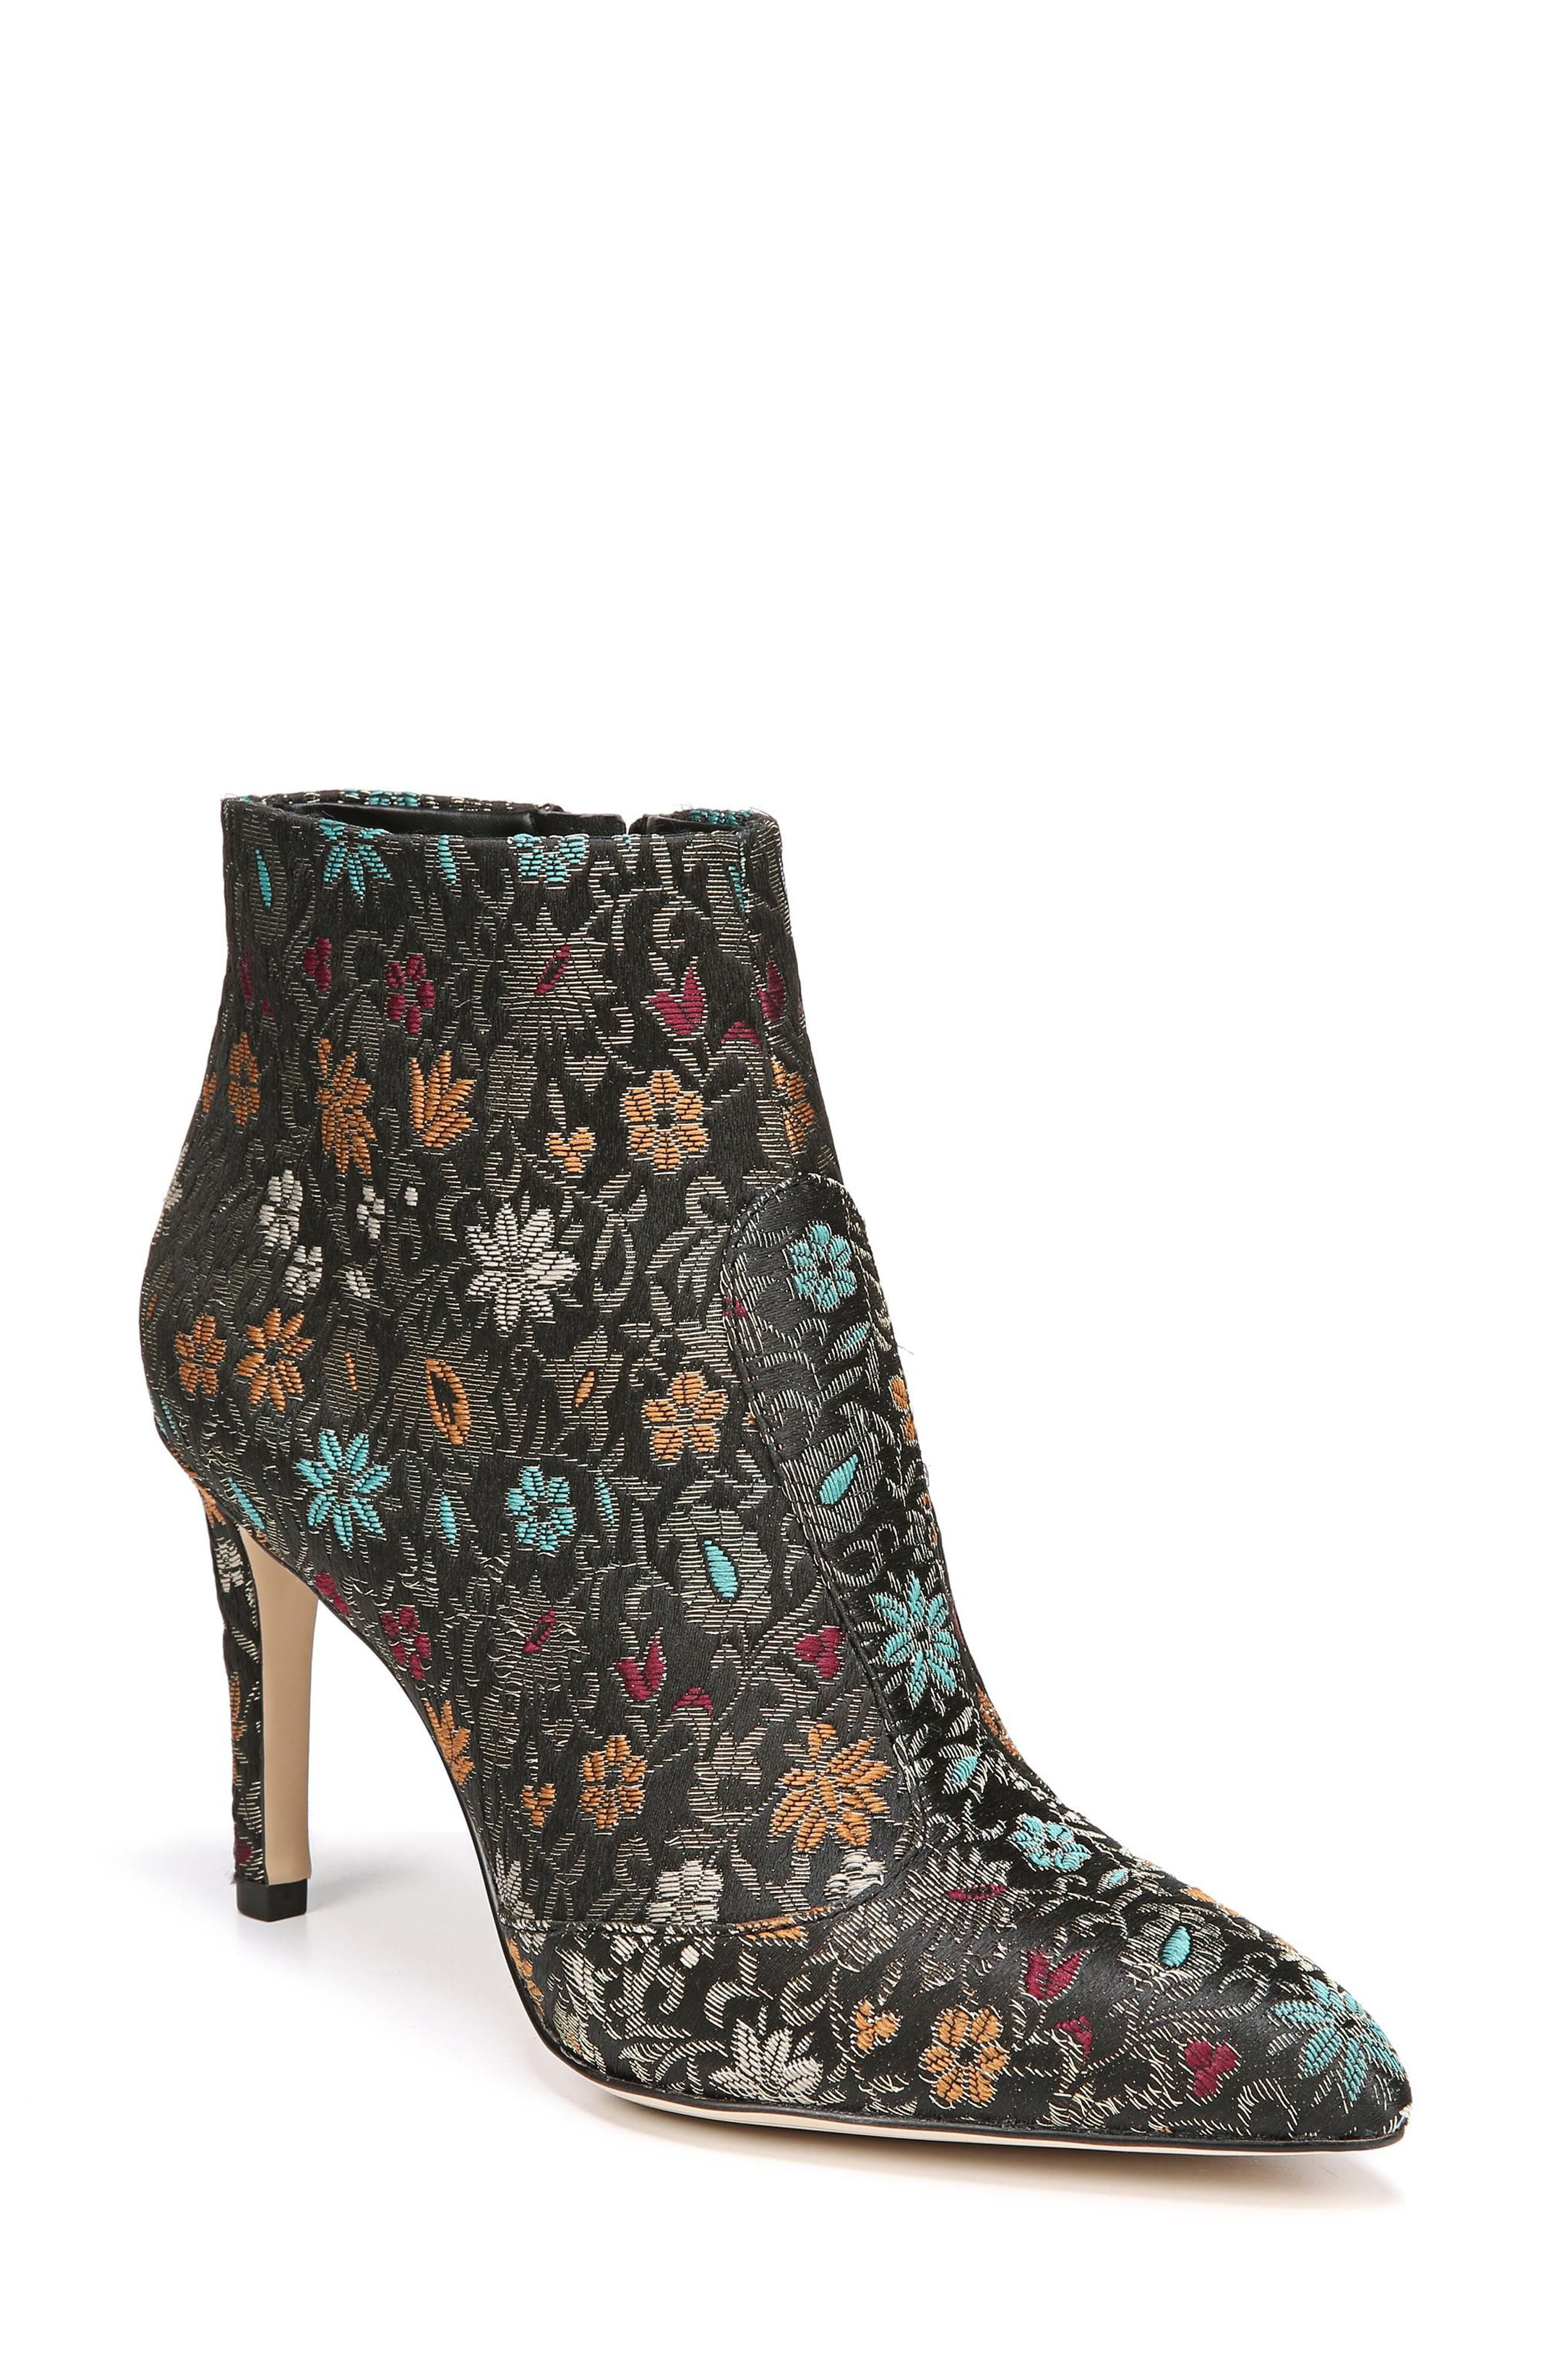 Olette Pointy Toe Bootie,                         Main,                         color, Black Floral Brocade